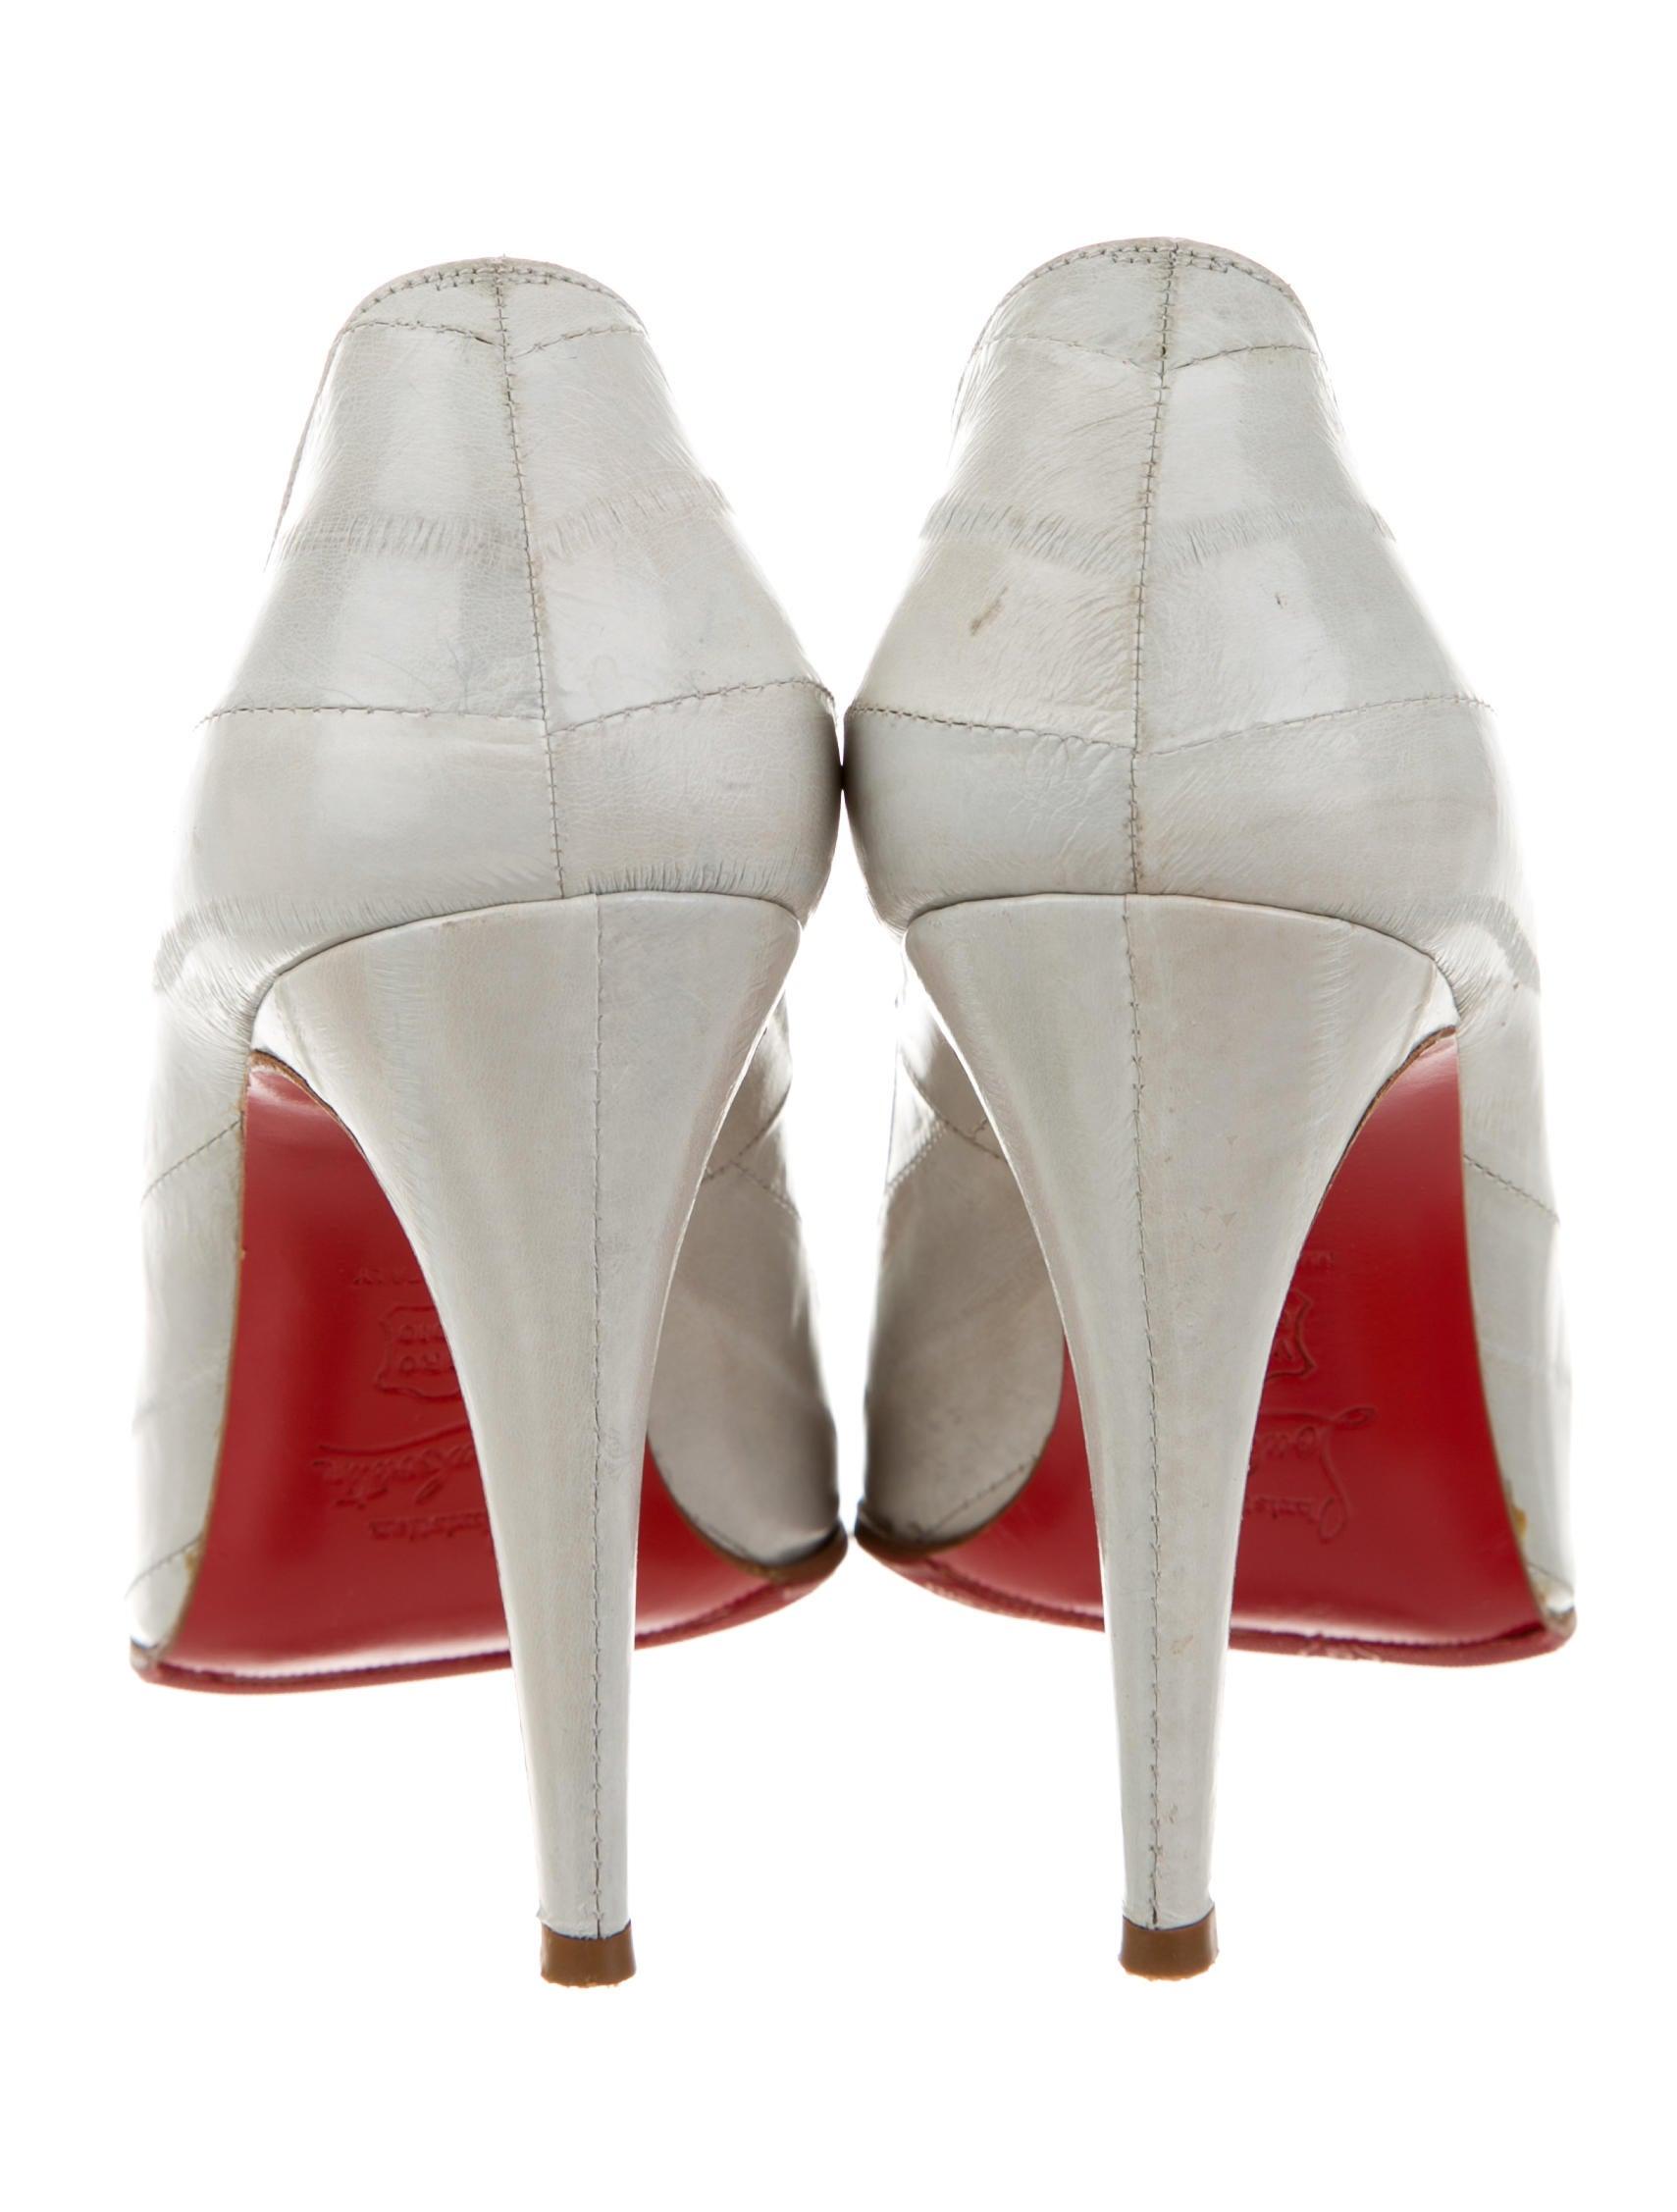 Christian Louboutin Eel Skin Decollete 868 Pumps - Shoes ...